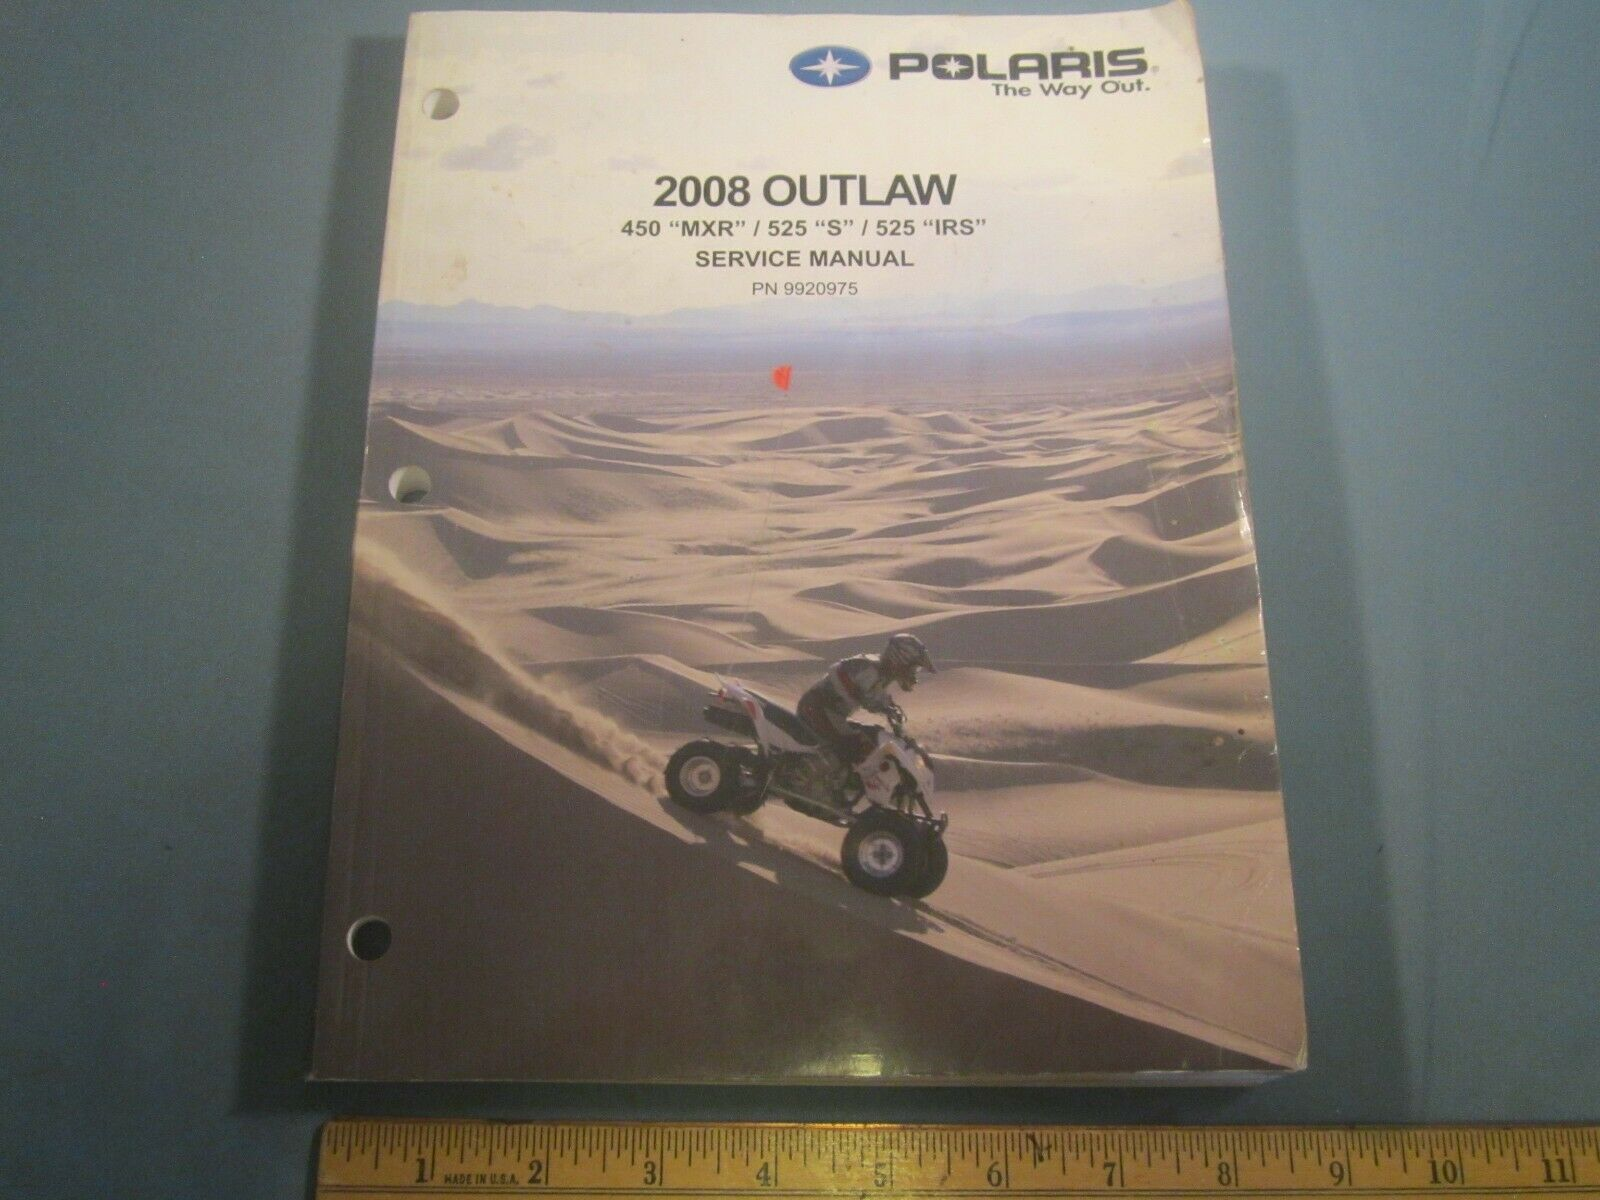 "POLARIS 2008 Outlaw Service Manual 450 ""MXR"" / 525 ""S"" / 525 ""IRS"" [Z142d] - $28.80"